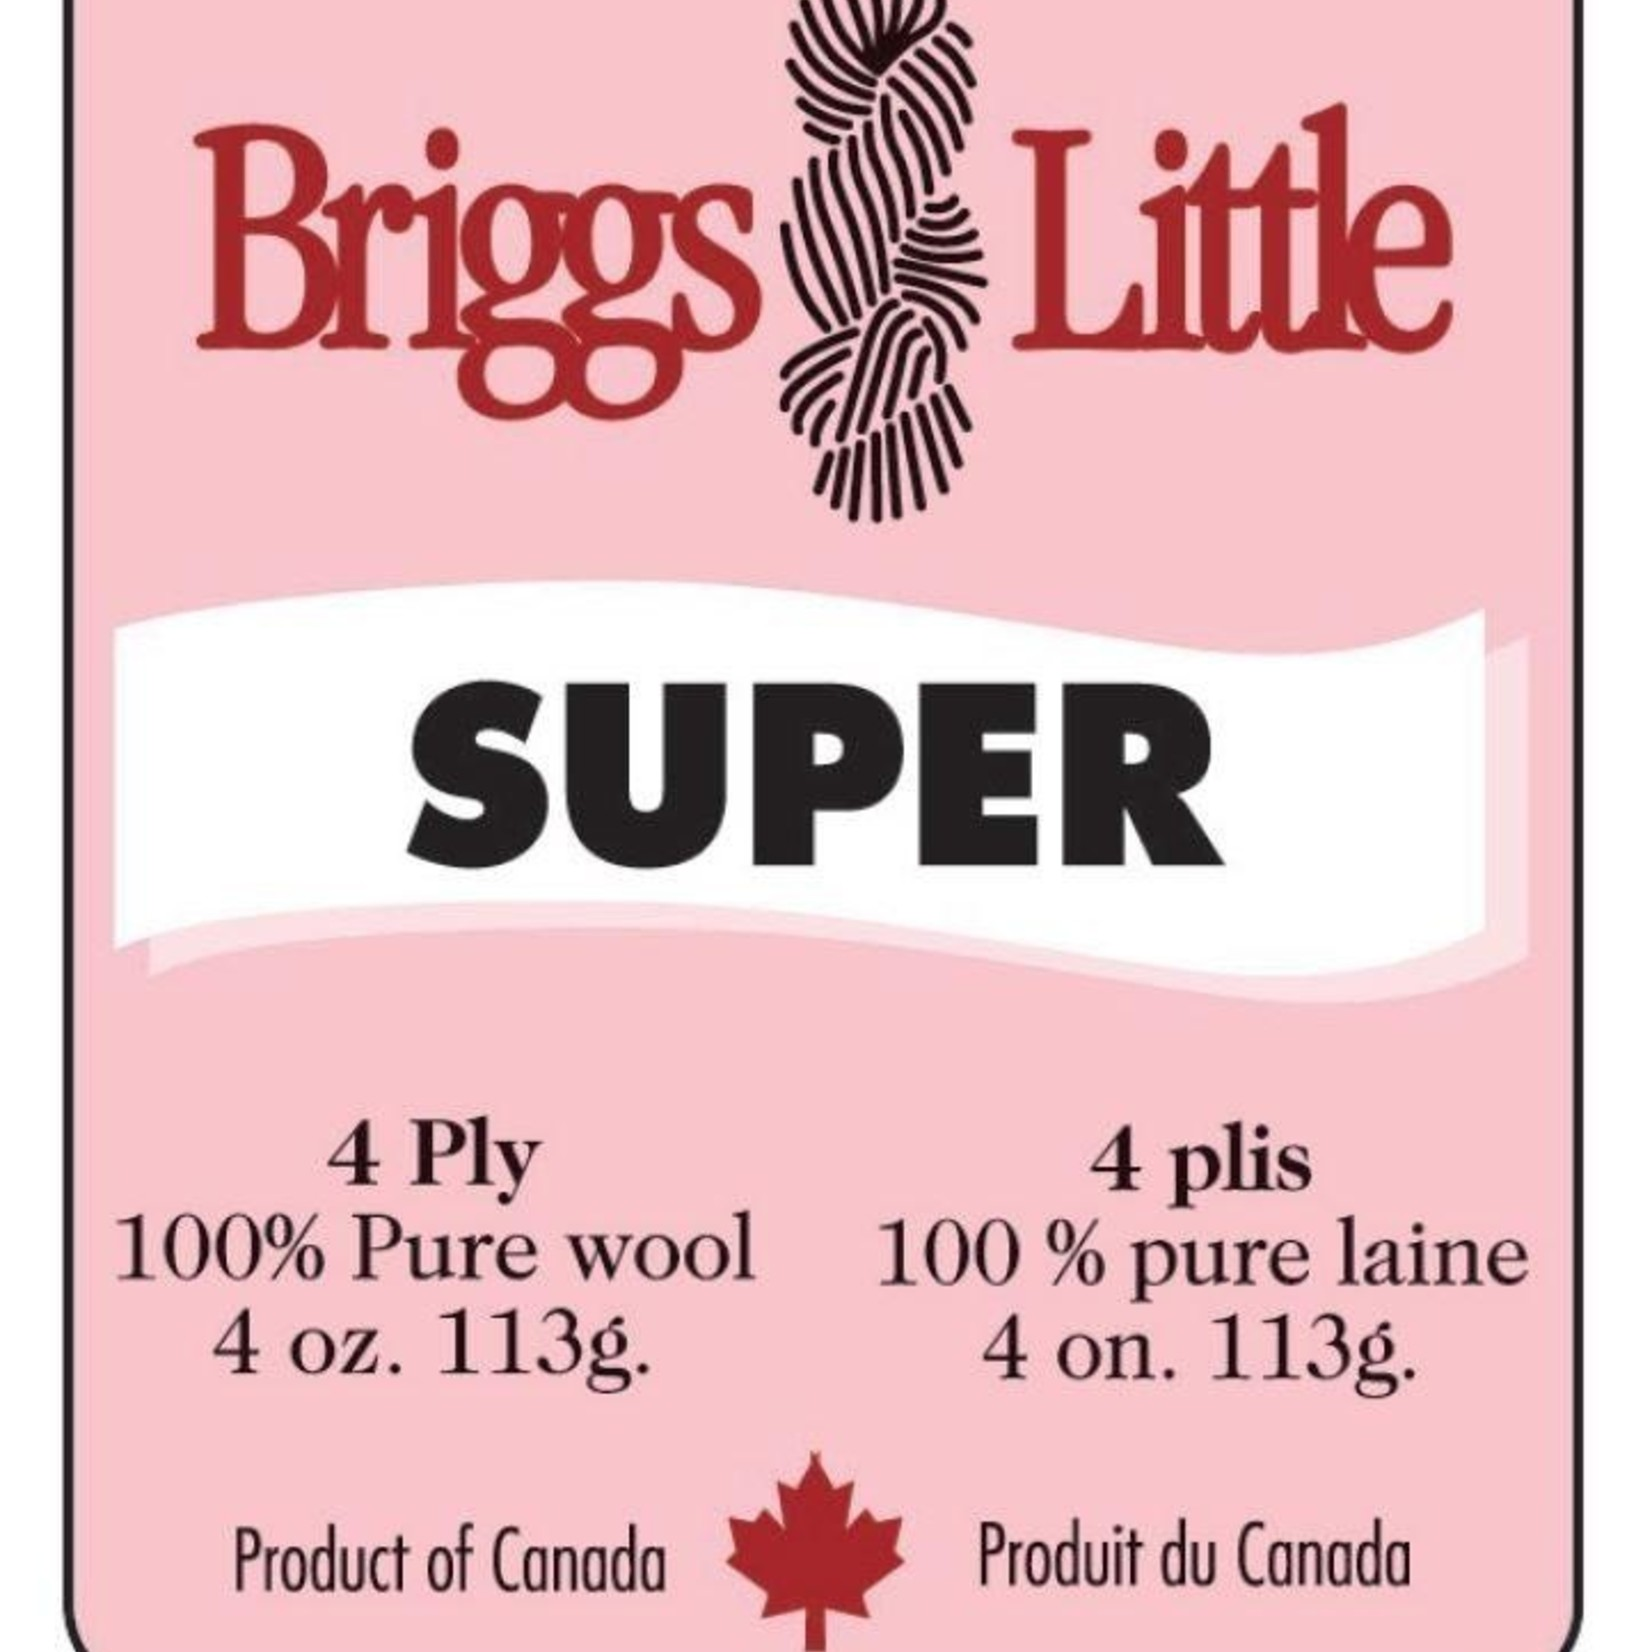 Briggs & Little Super Yarn by Briggs & Little